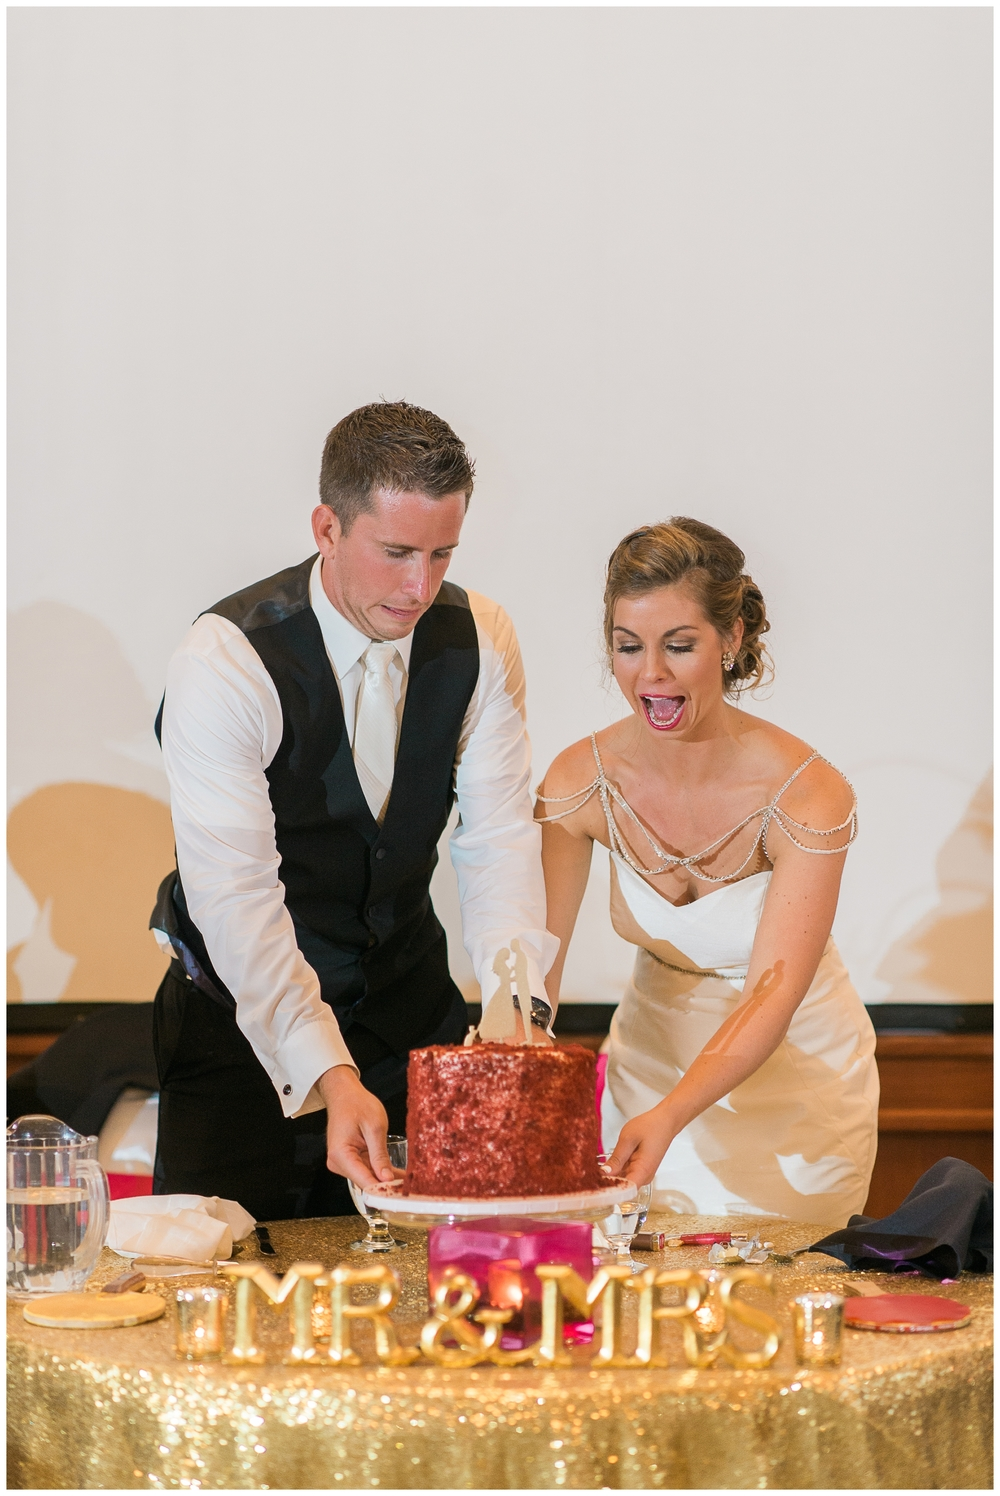 Rebecca_Bridges_Photography_Indianapolis_Wedding_Photographer_5118.jpg